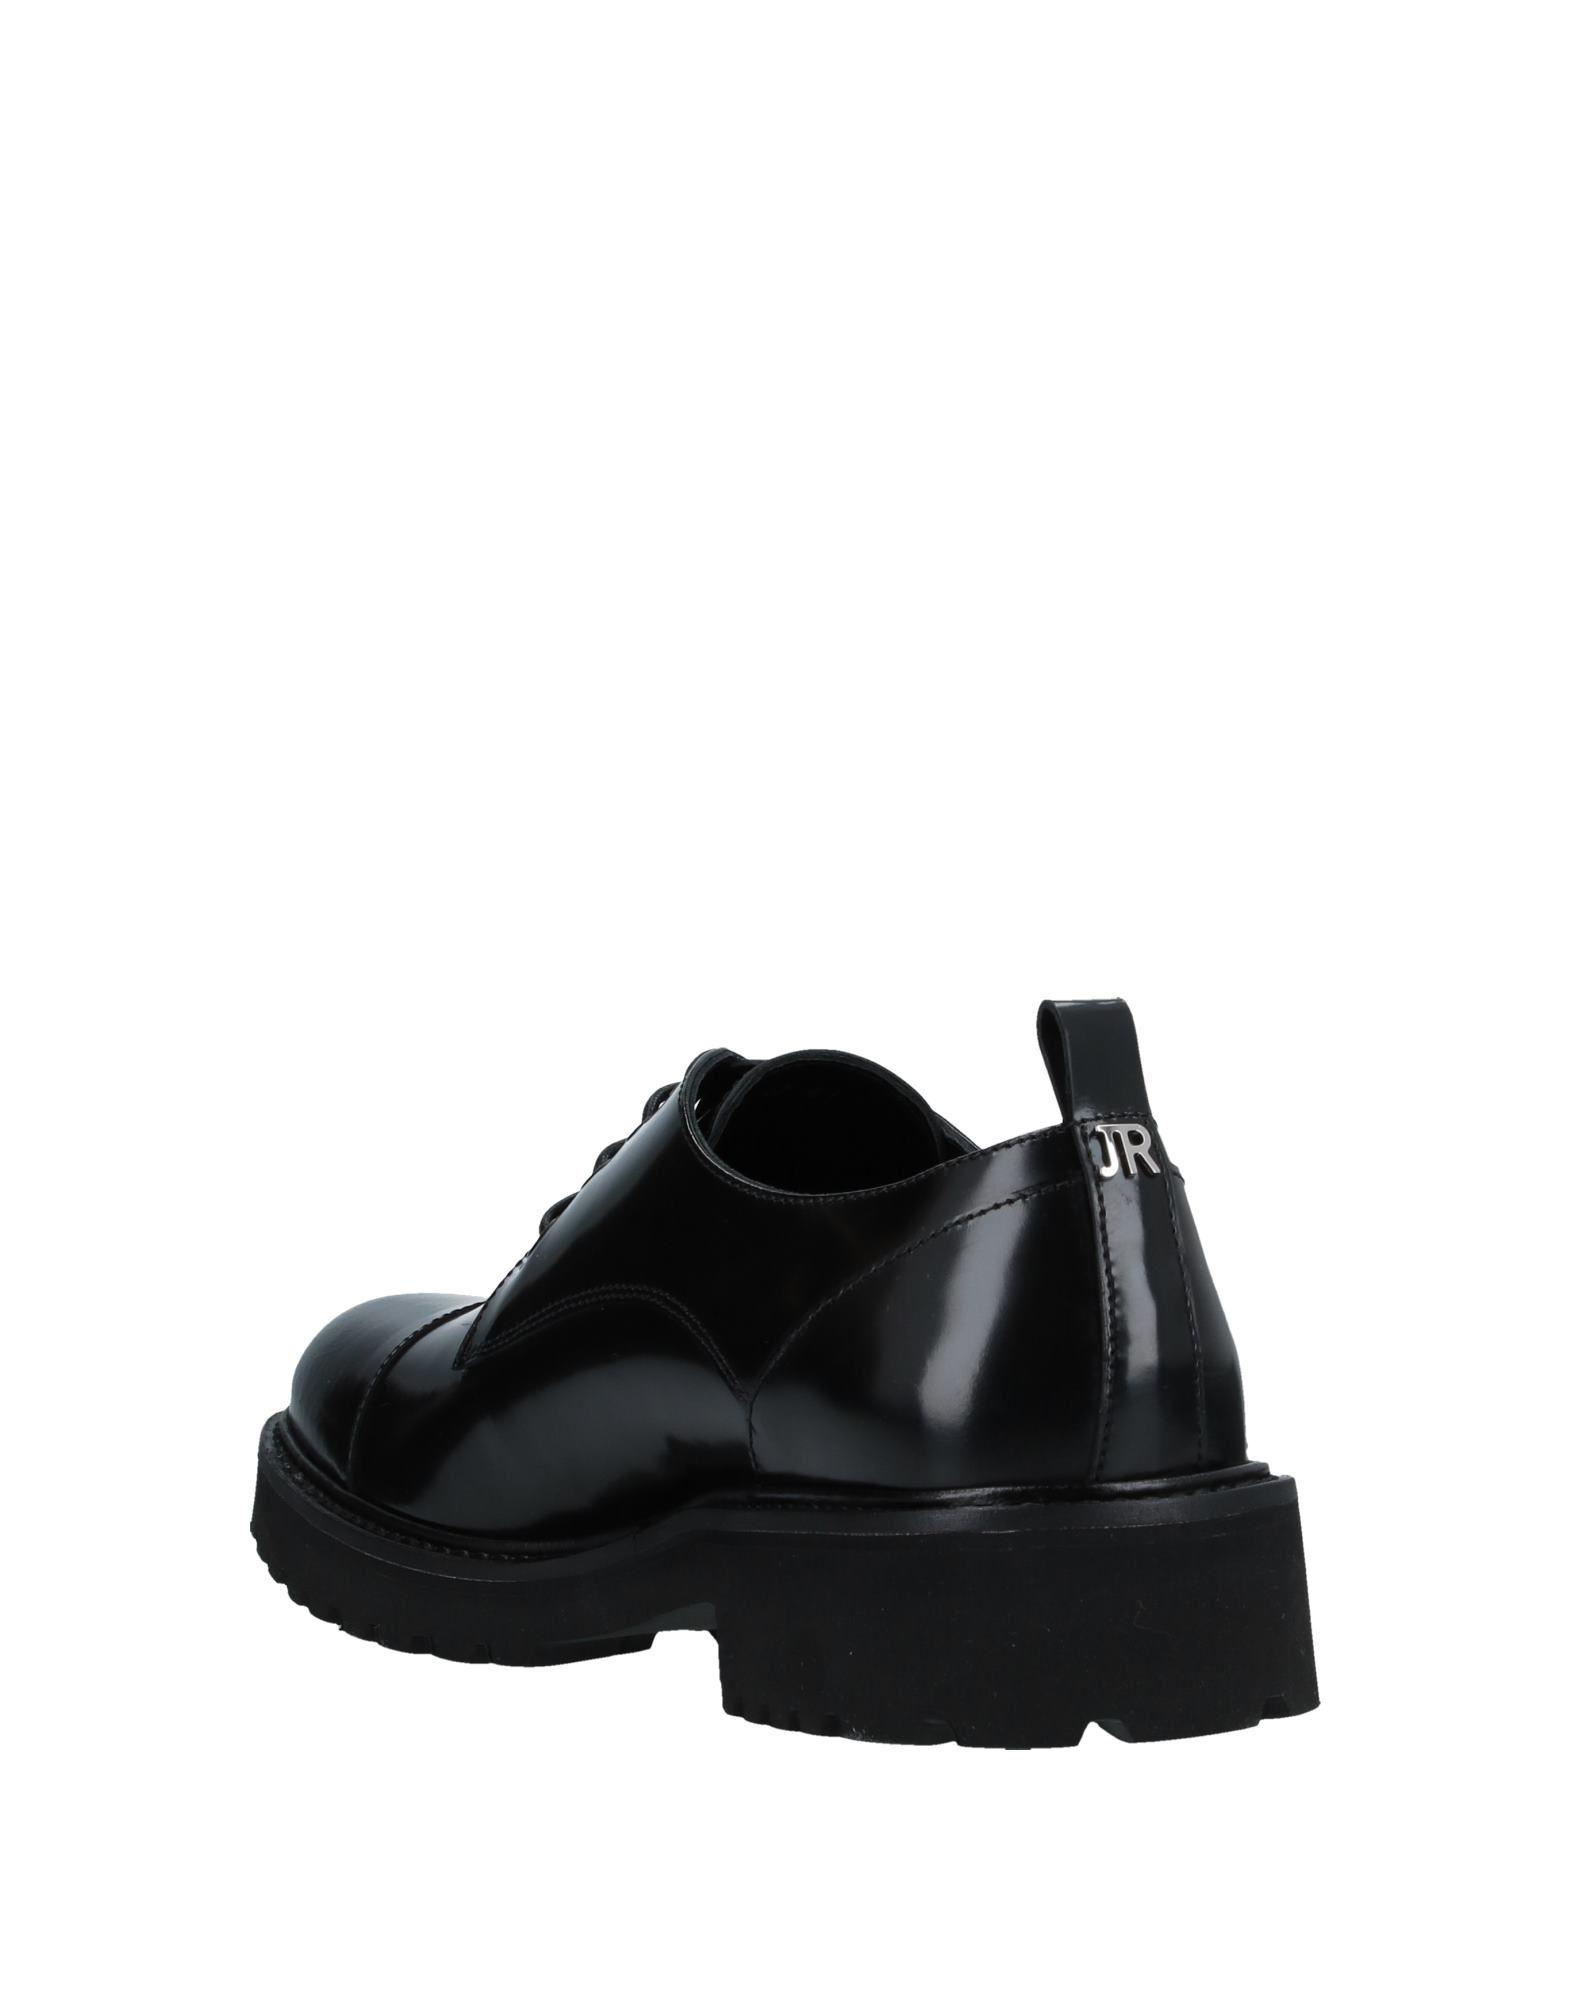 John Richmond Black Polished Leather Lace Up Shoes